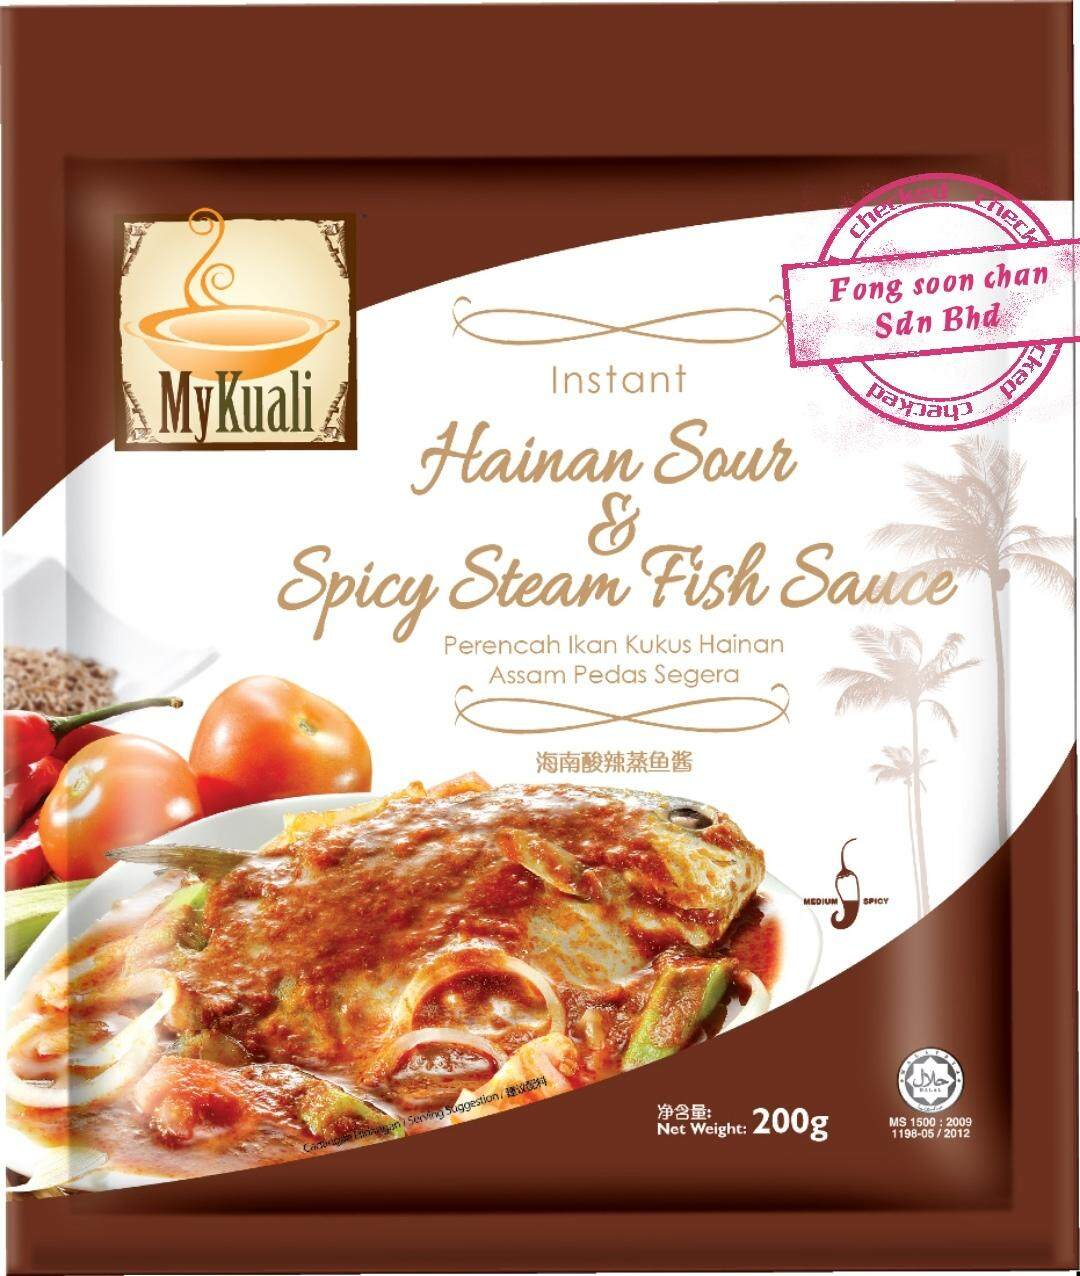 [FSC] Mykuali Instant Hainan Sour & Spicy Steam Fish Paste 200gm